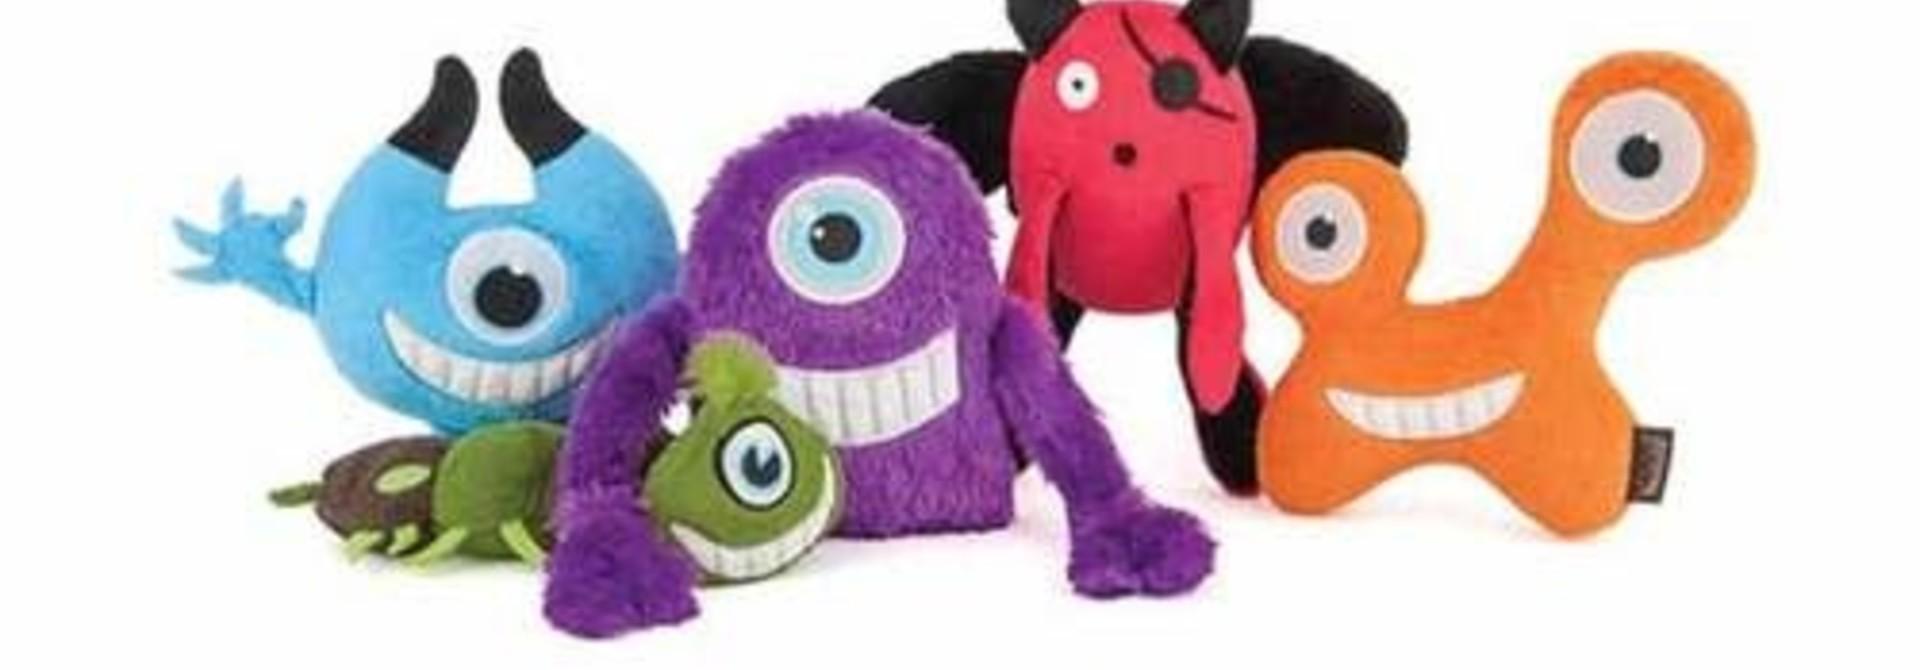 Momo Assorted Monster Toys-Dog